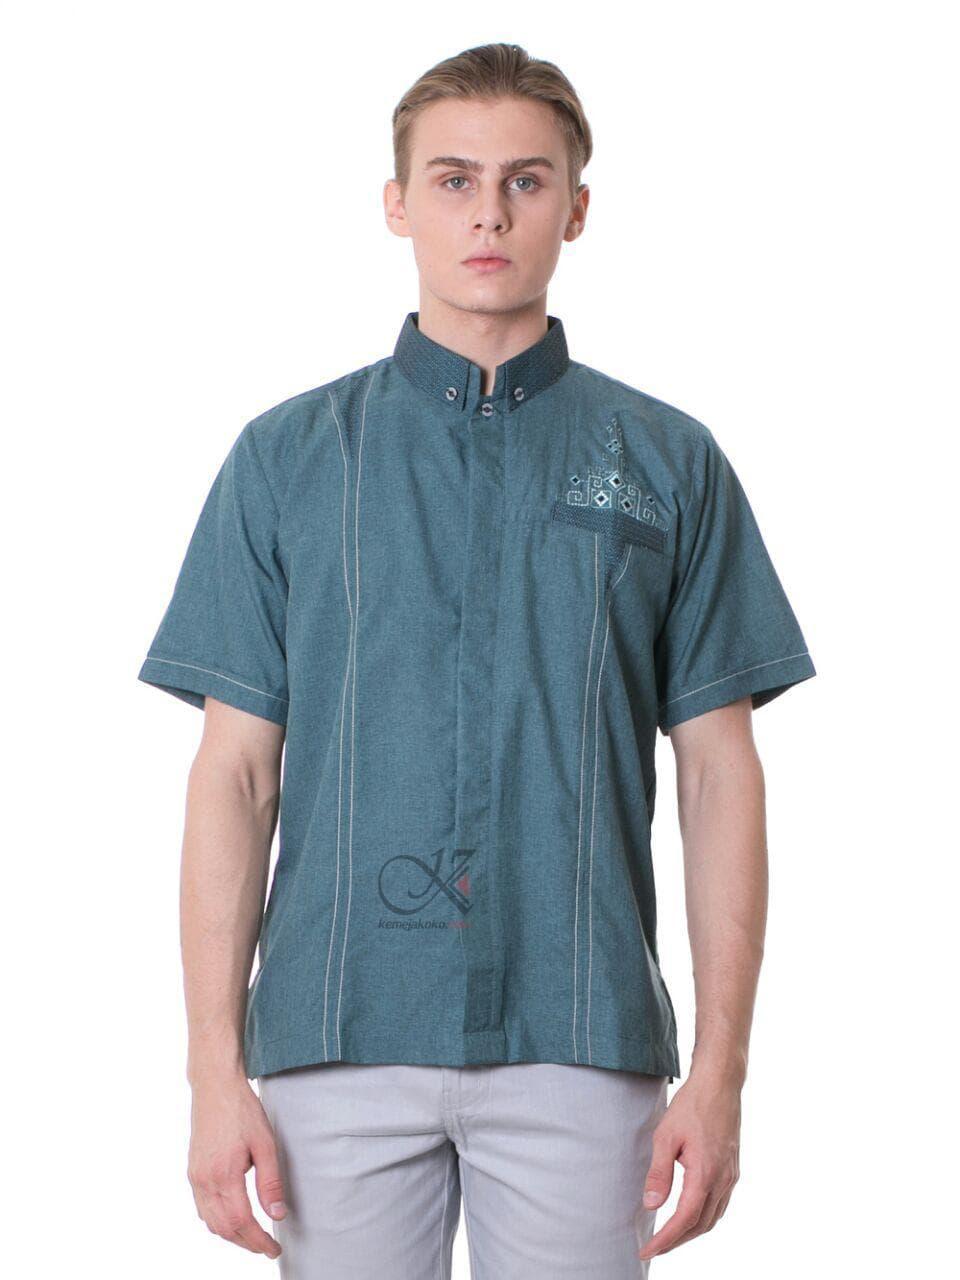 Daftar Harga Baju Koko Pria Modis Termurah Fashion Keren Katun Coklat Kok 1735 Kemeja Trendi Terkini Modern Elegan Twl 18 Hijau